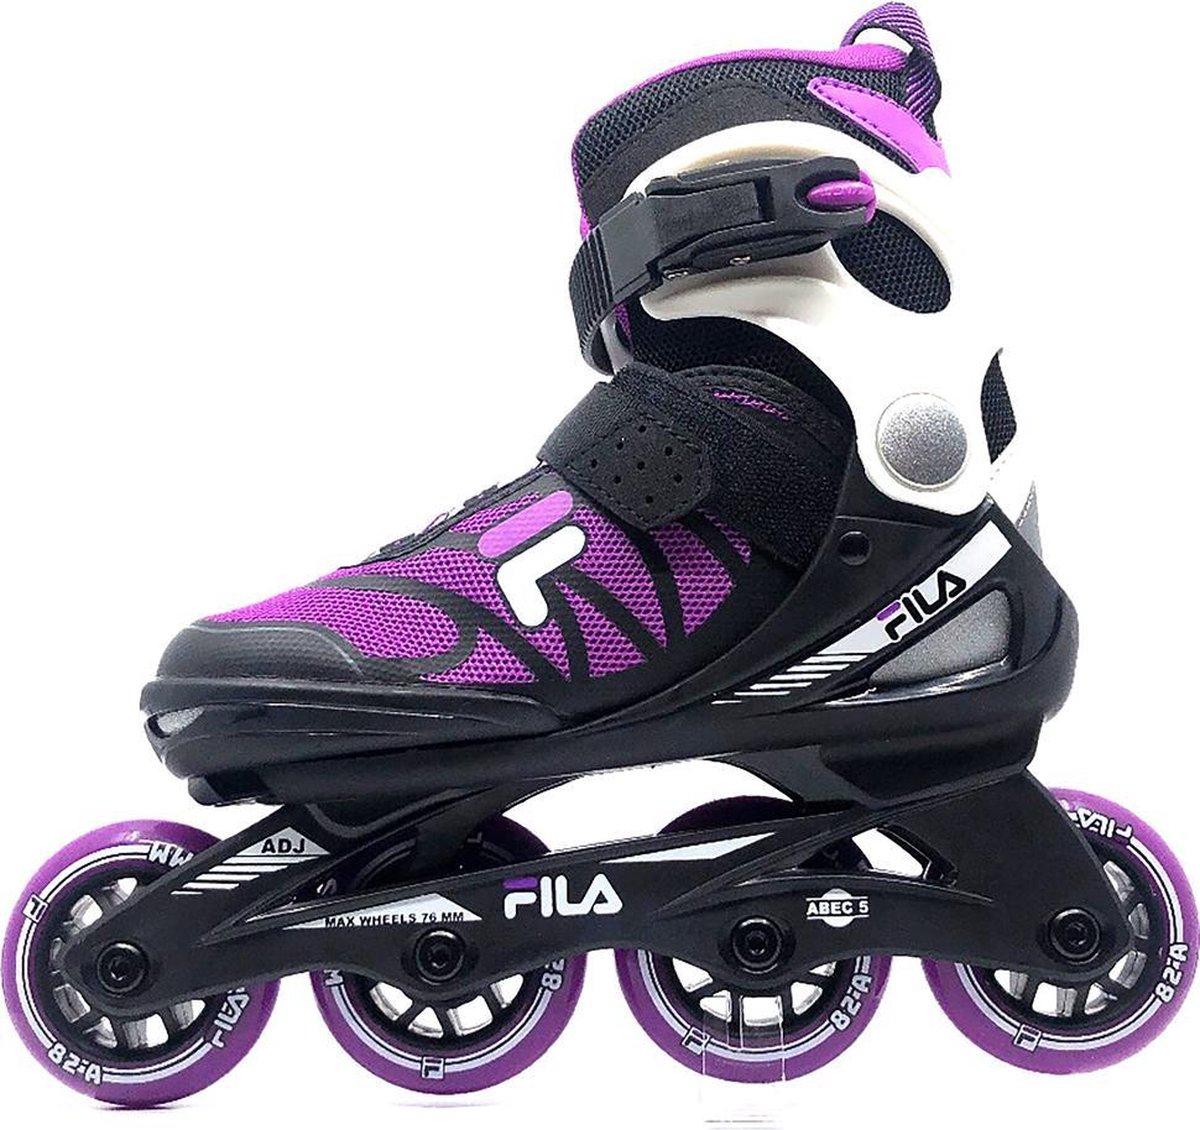 Fila - Verstelbare inline skates - J one - 21' - Maat 28-32 - Magenta - Zwart